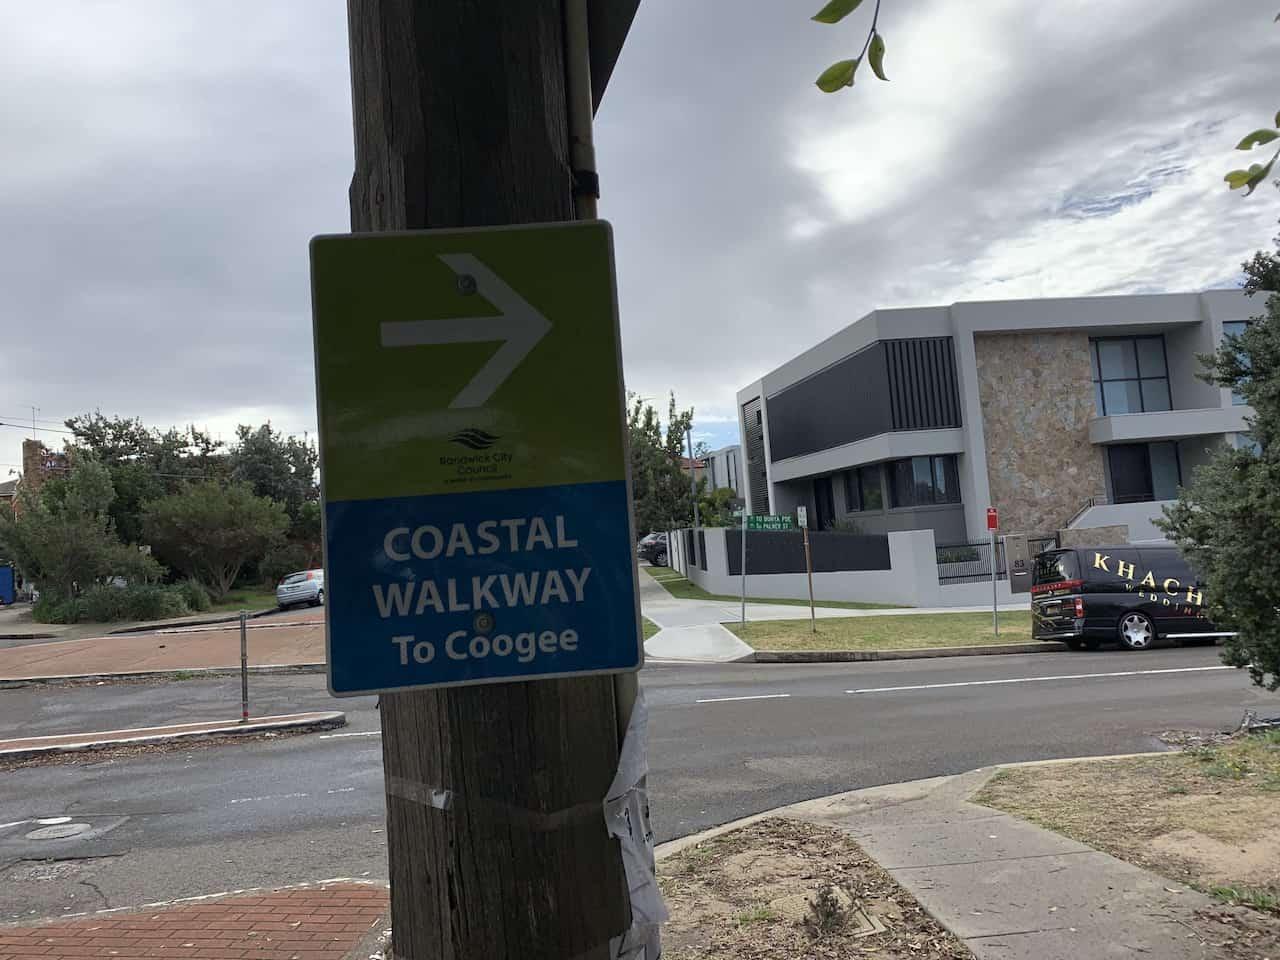 Coastal Walkway to Coogee